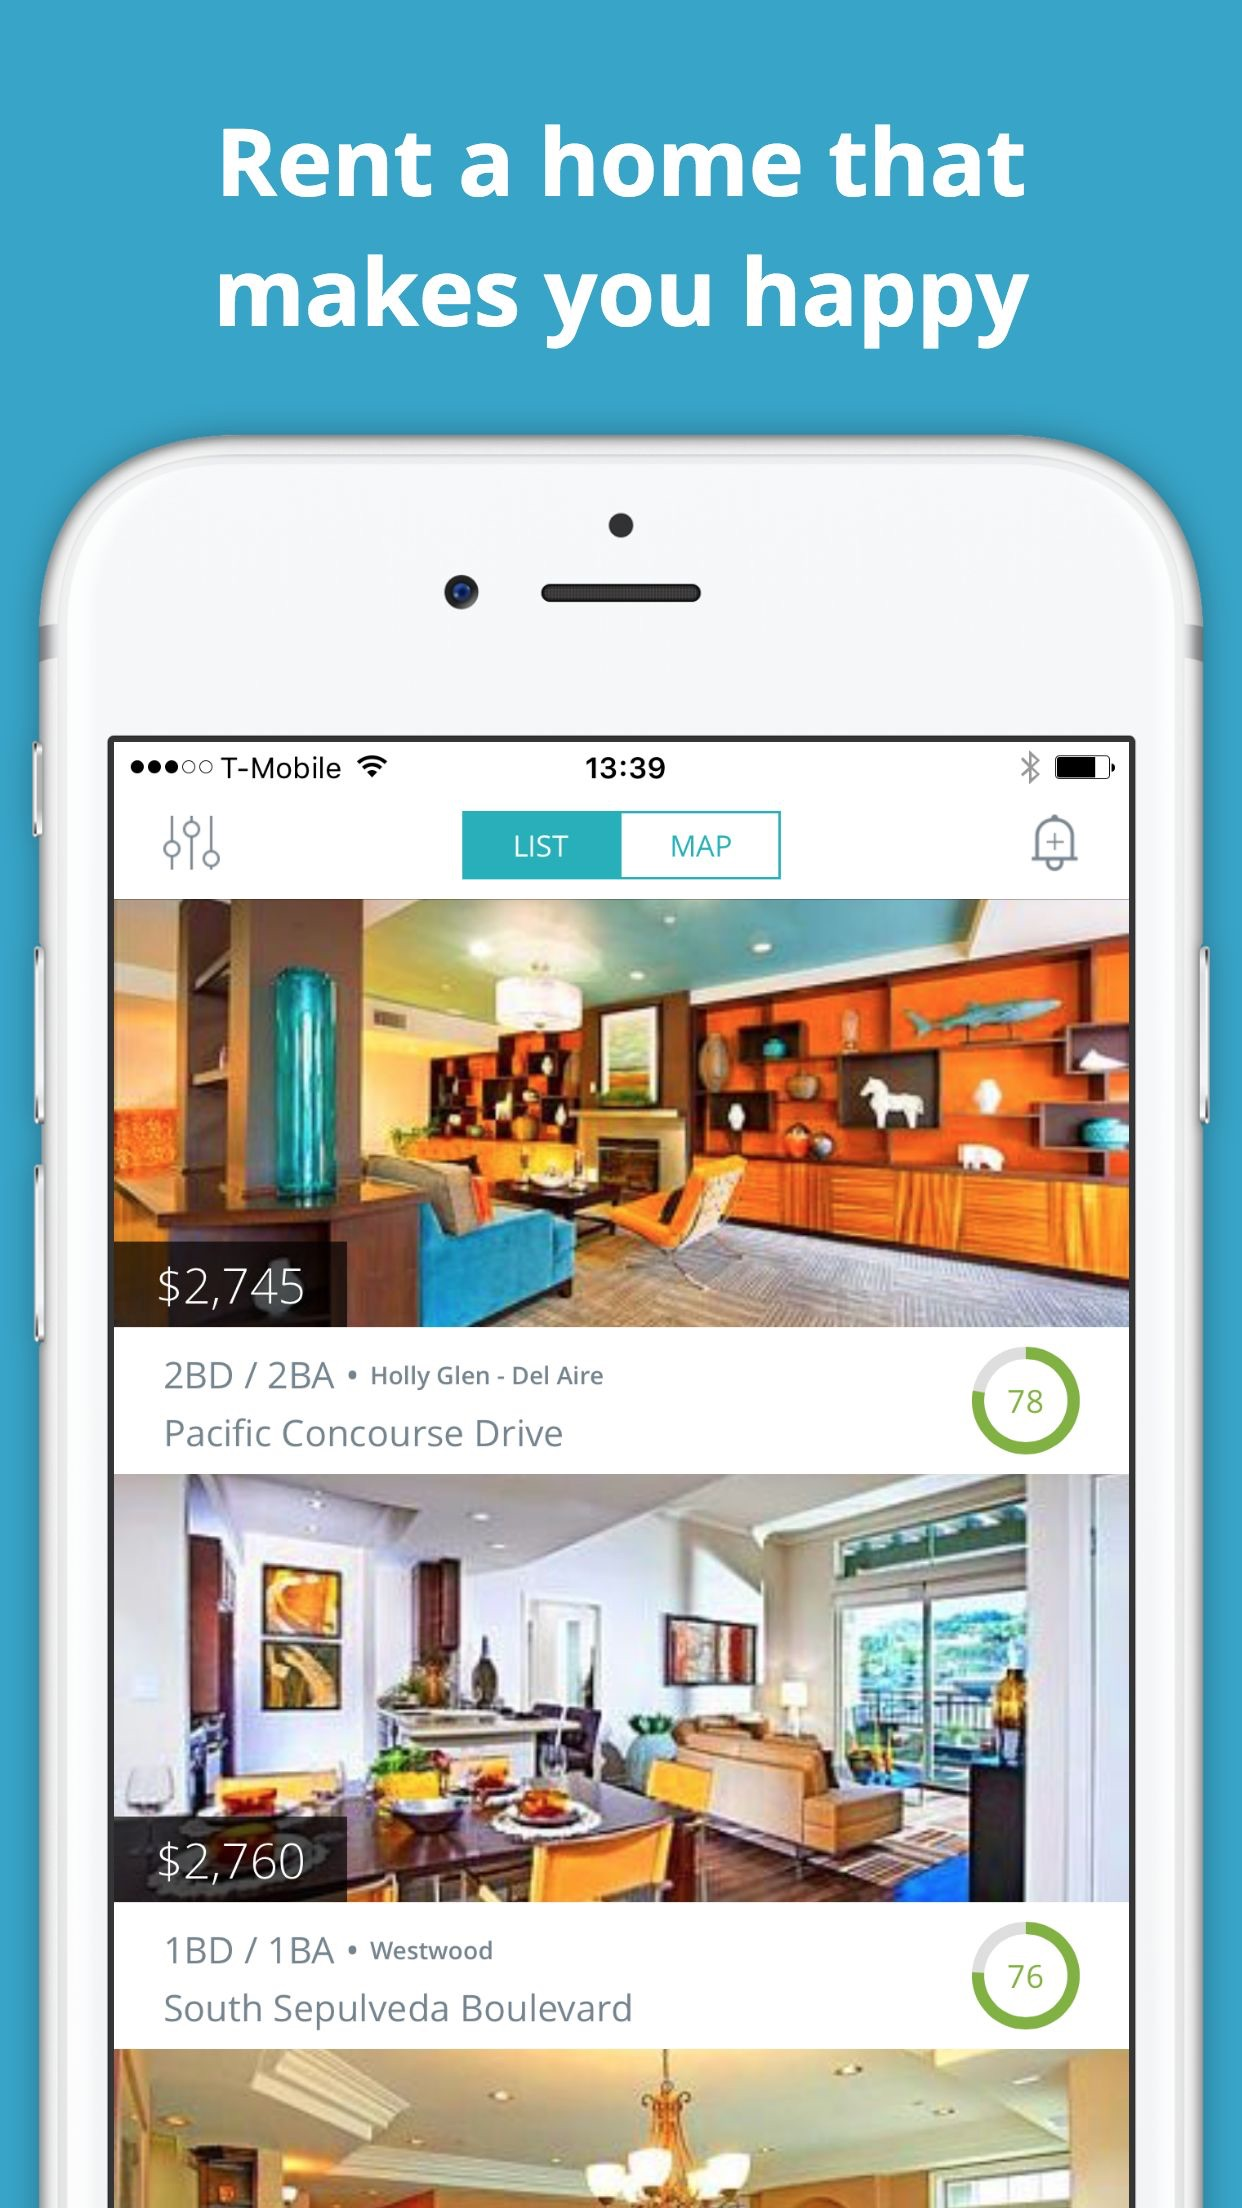 Apartments for Rent - House & Apartment Rentals Screenshot